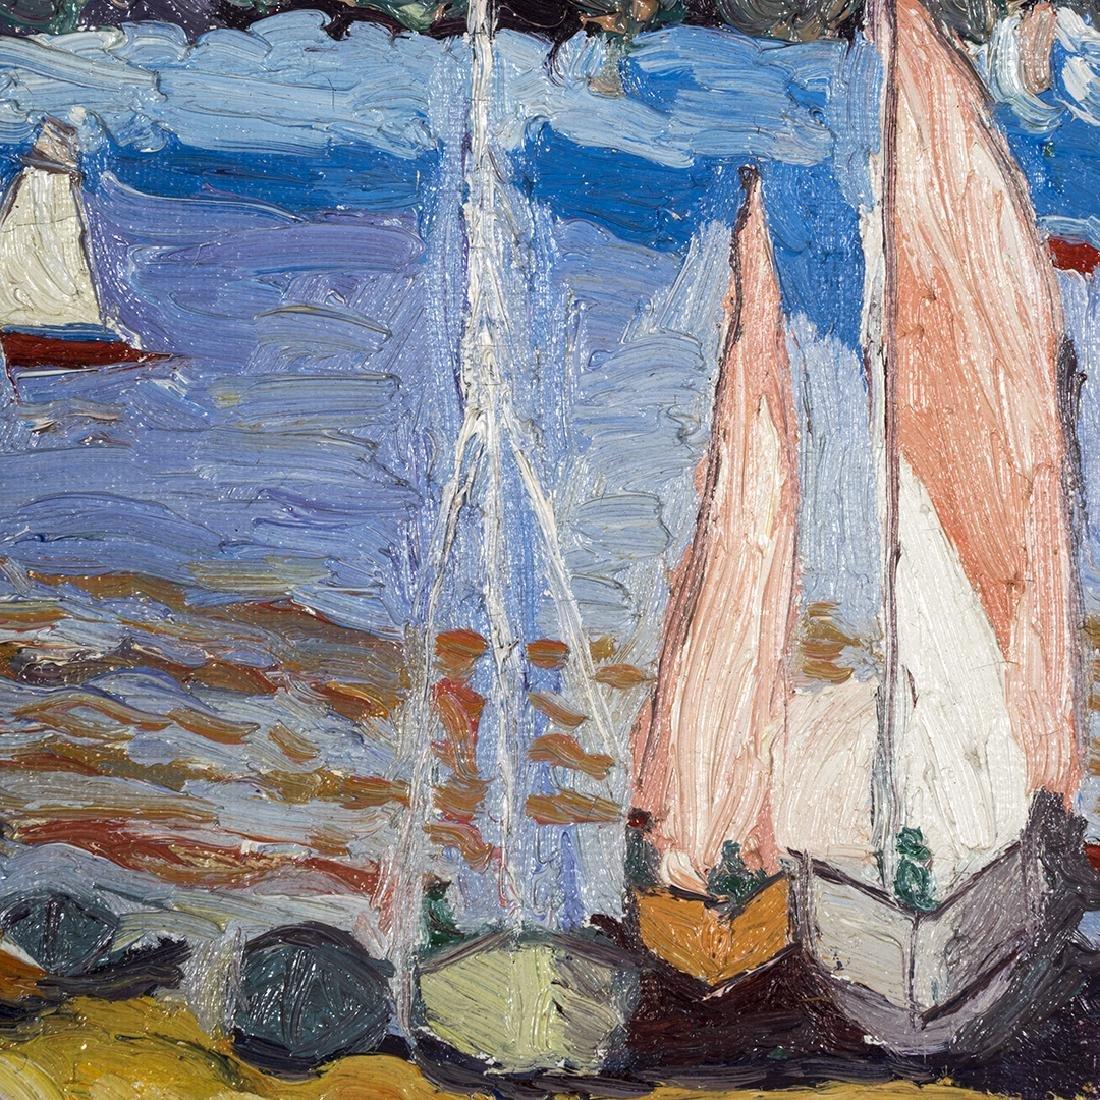 Katia Pissarro St. Halo Oil Painting - 3